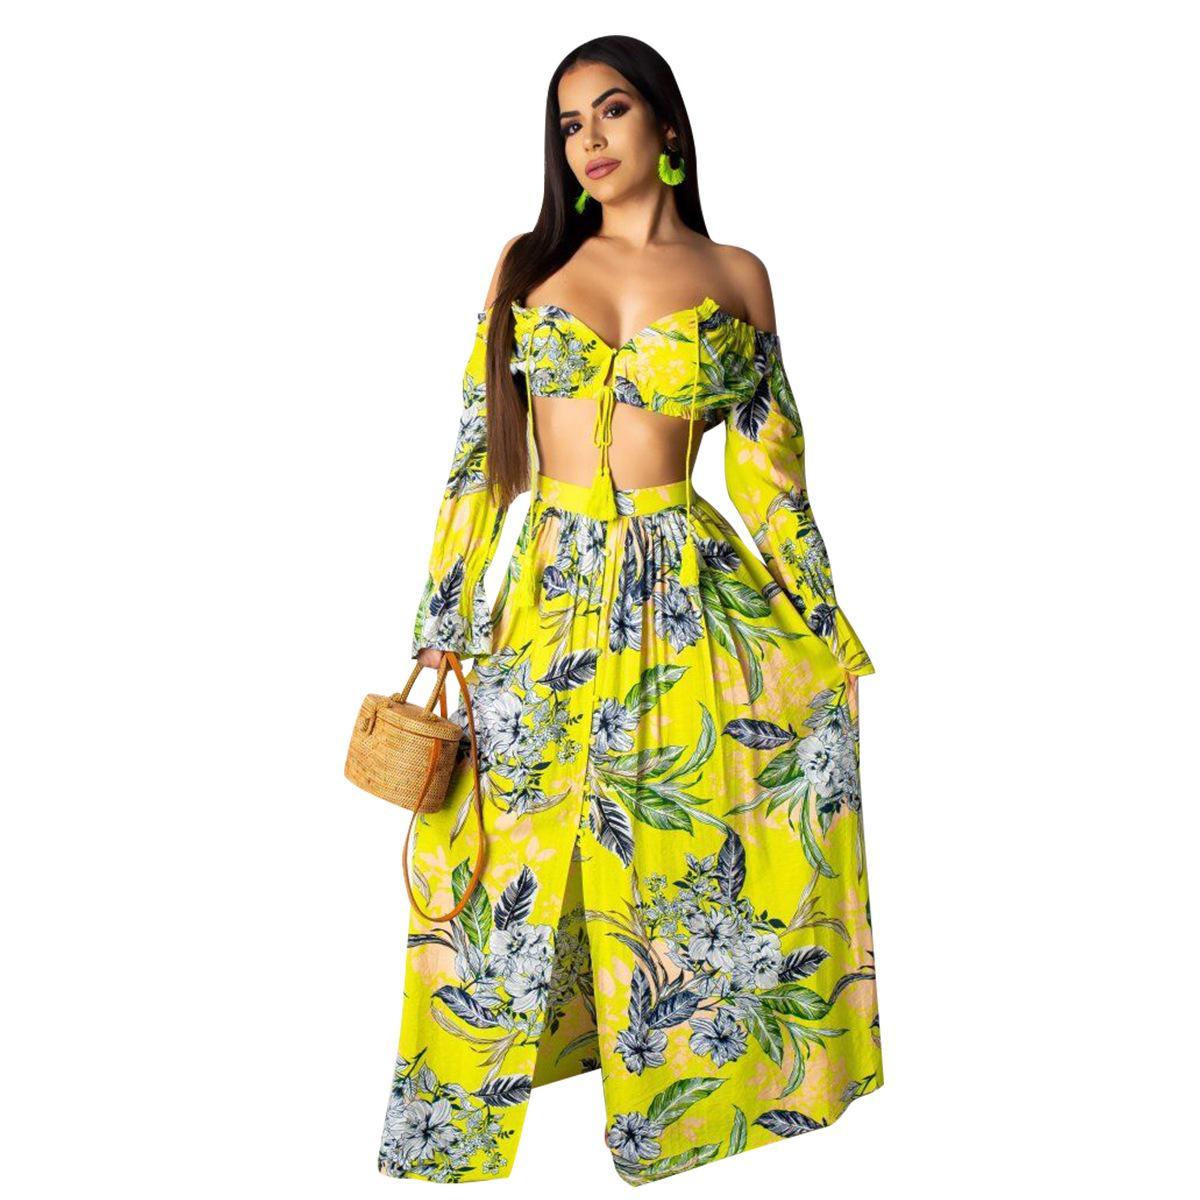 Women 2Pcs One Shoulder T-Shirt Maxi Skirt Suit Summer Beach Ladies Casual Dress